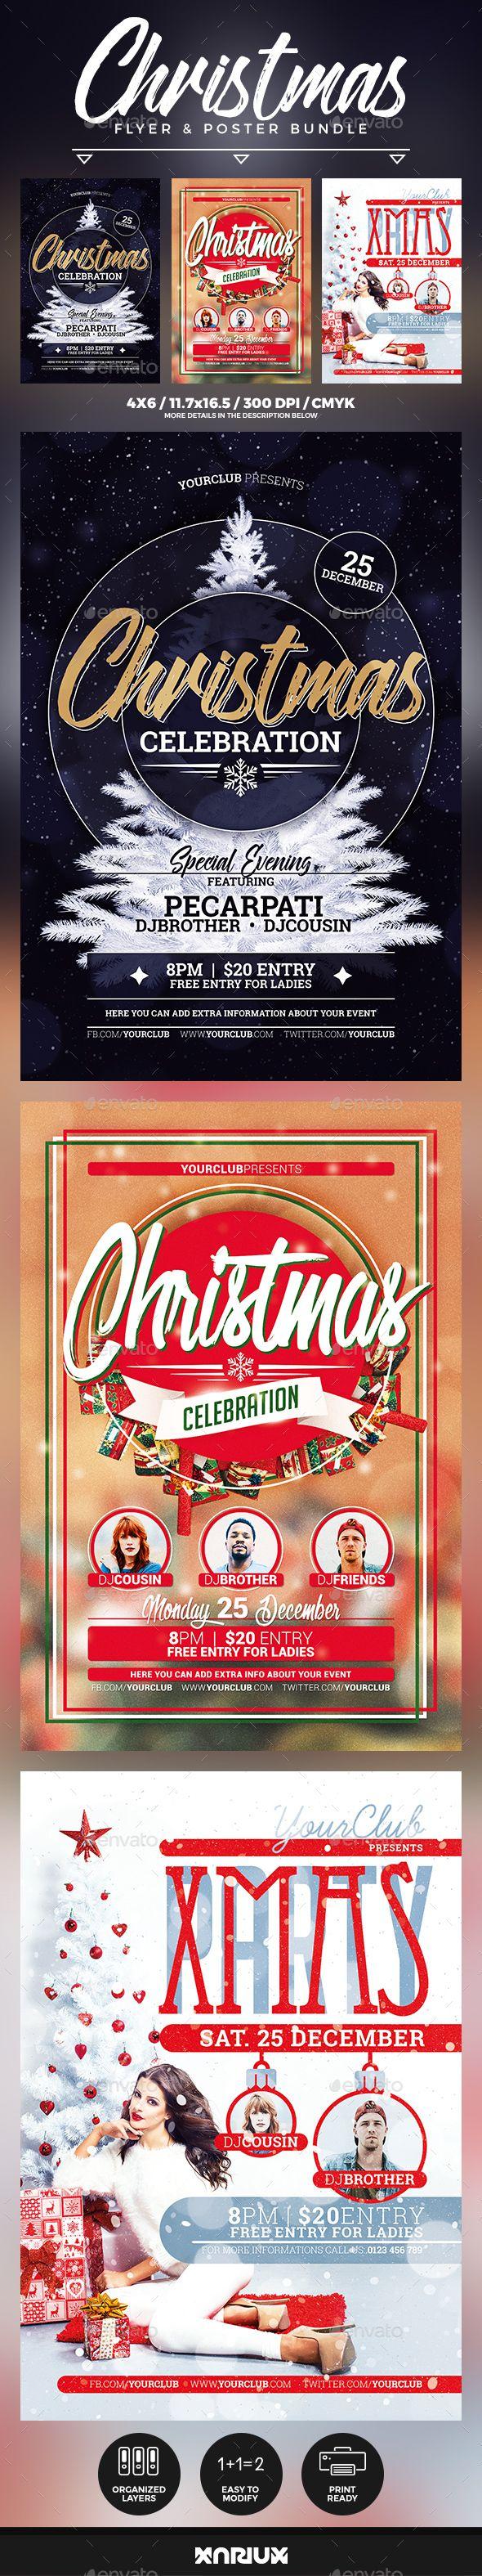 Christmas Flyer & Poster Bundle Template